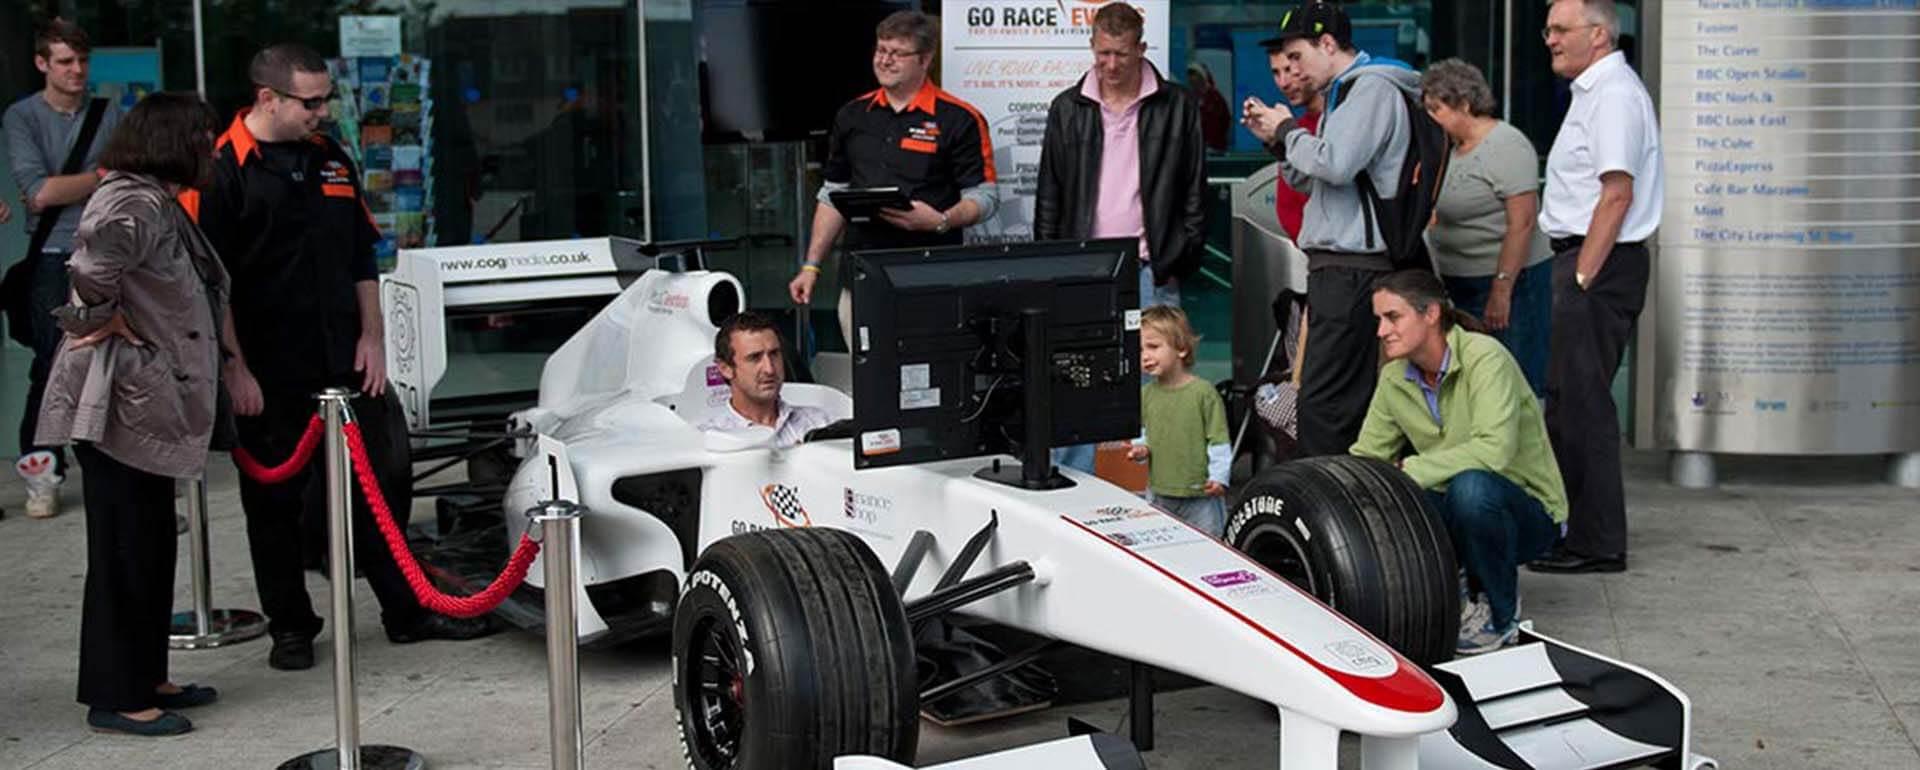 Go Race Events F1 Simulator